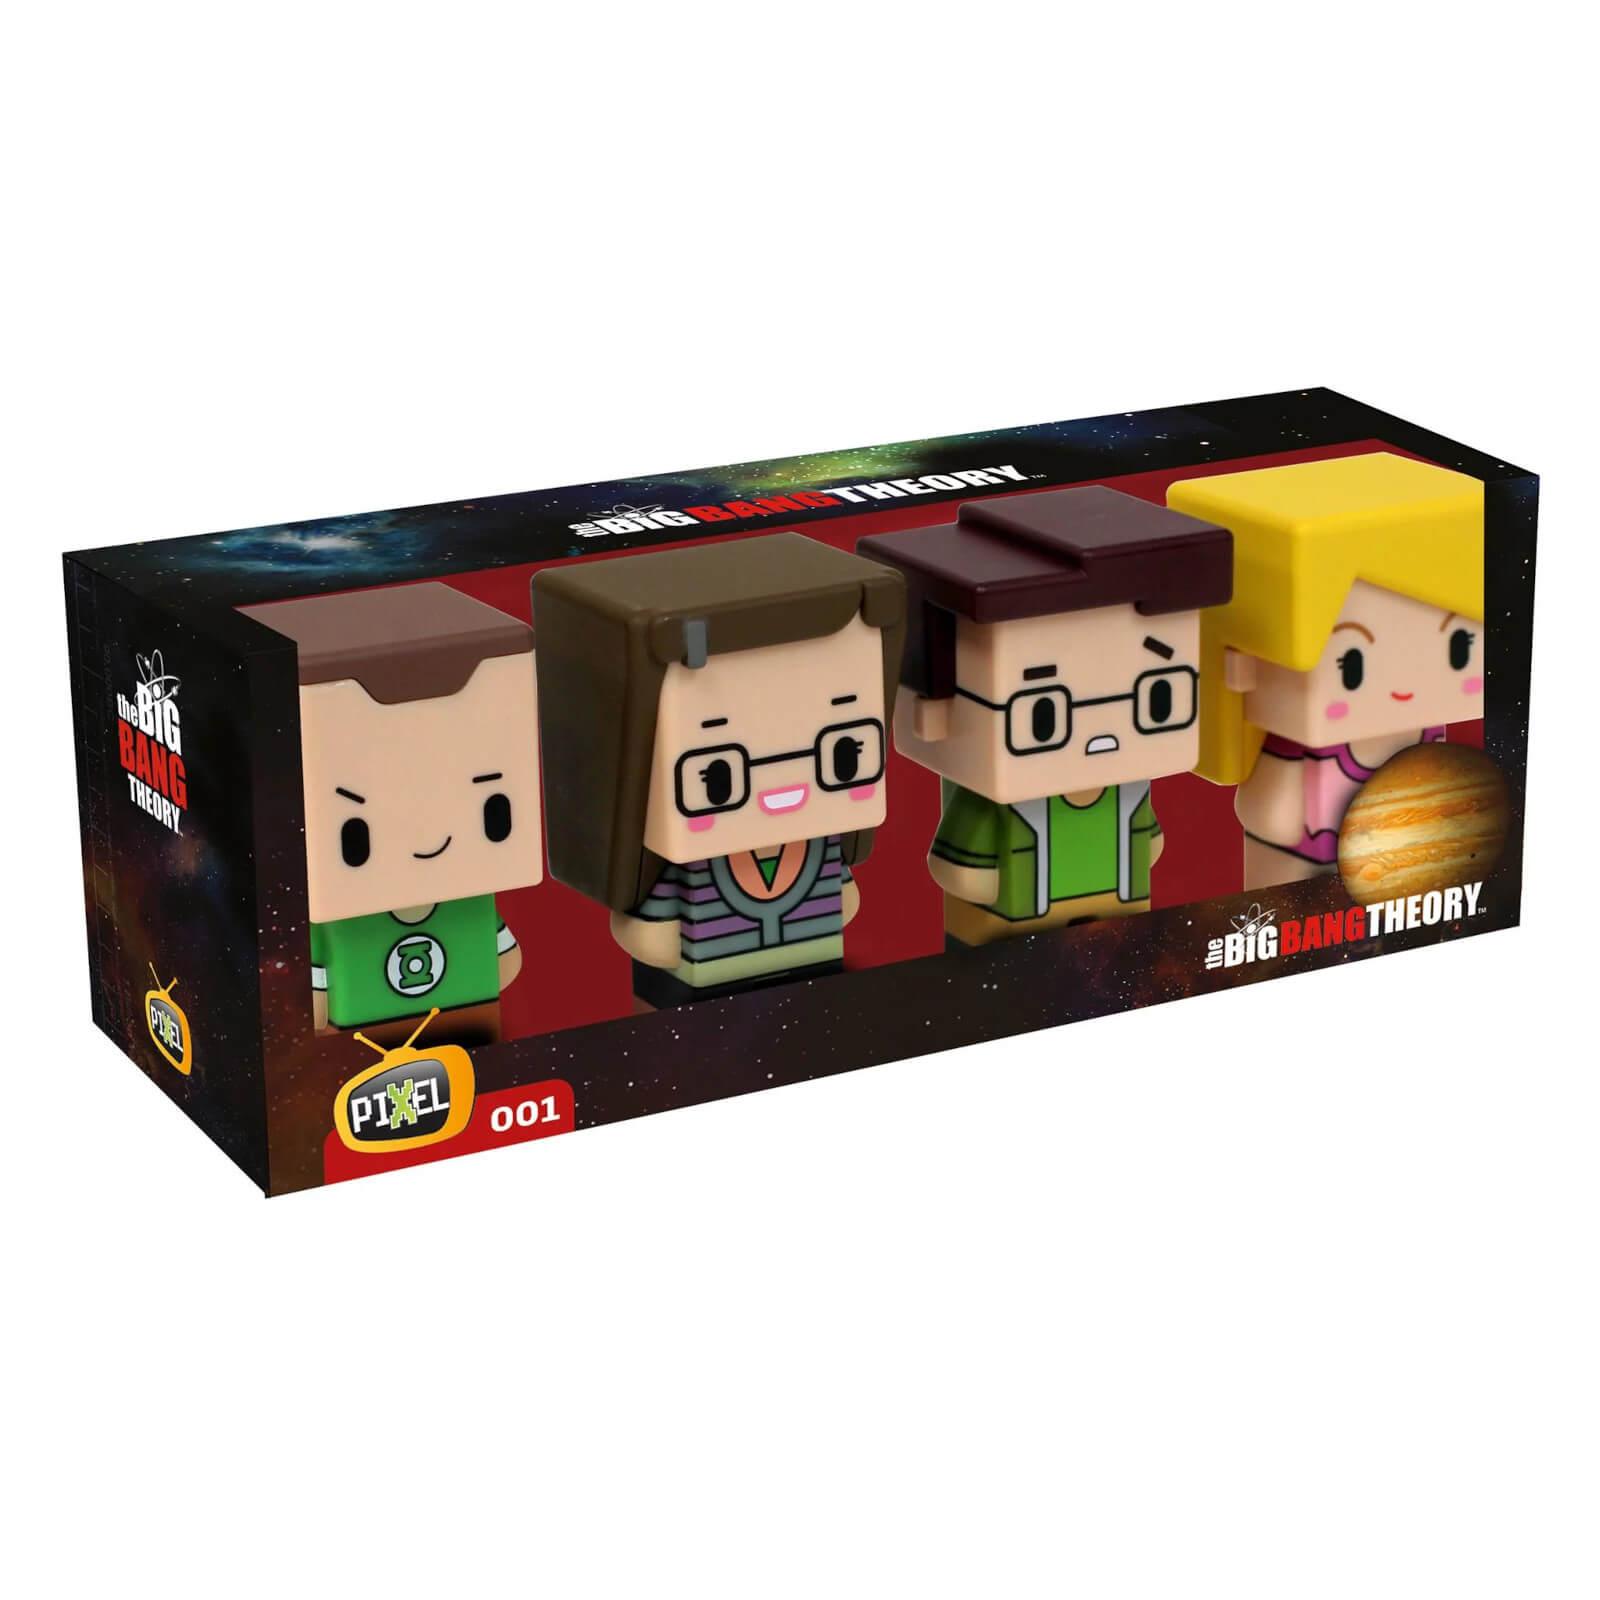 SD Toys Pixel Figure Big Bang Theory Set 4 Figures 7cm